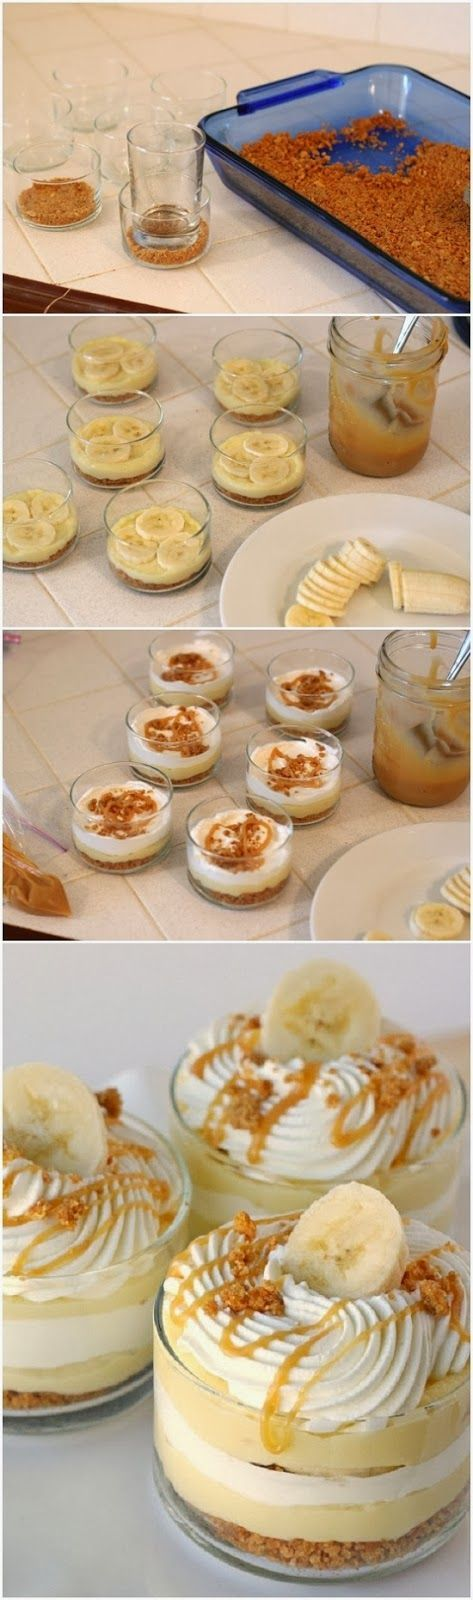 Banana Caramel Cream Dessert. Substitute sweeteners with Kelly's Delight! [ KellysDelight.com ] #dessert #delight #sugar